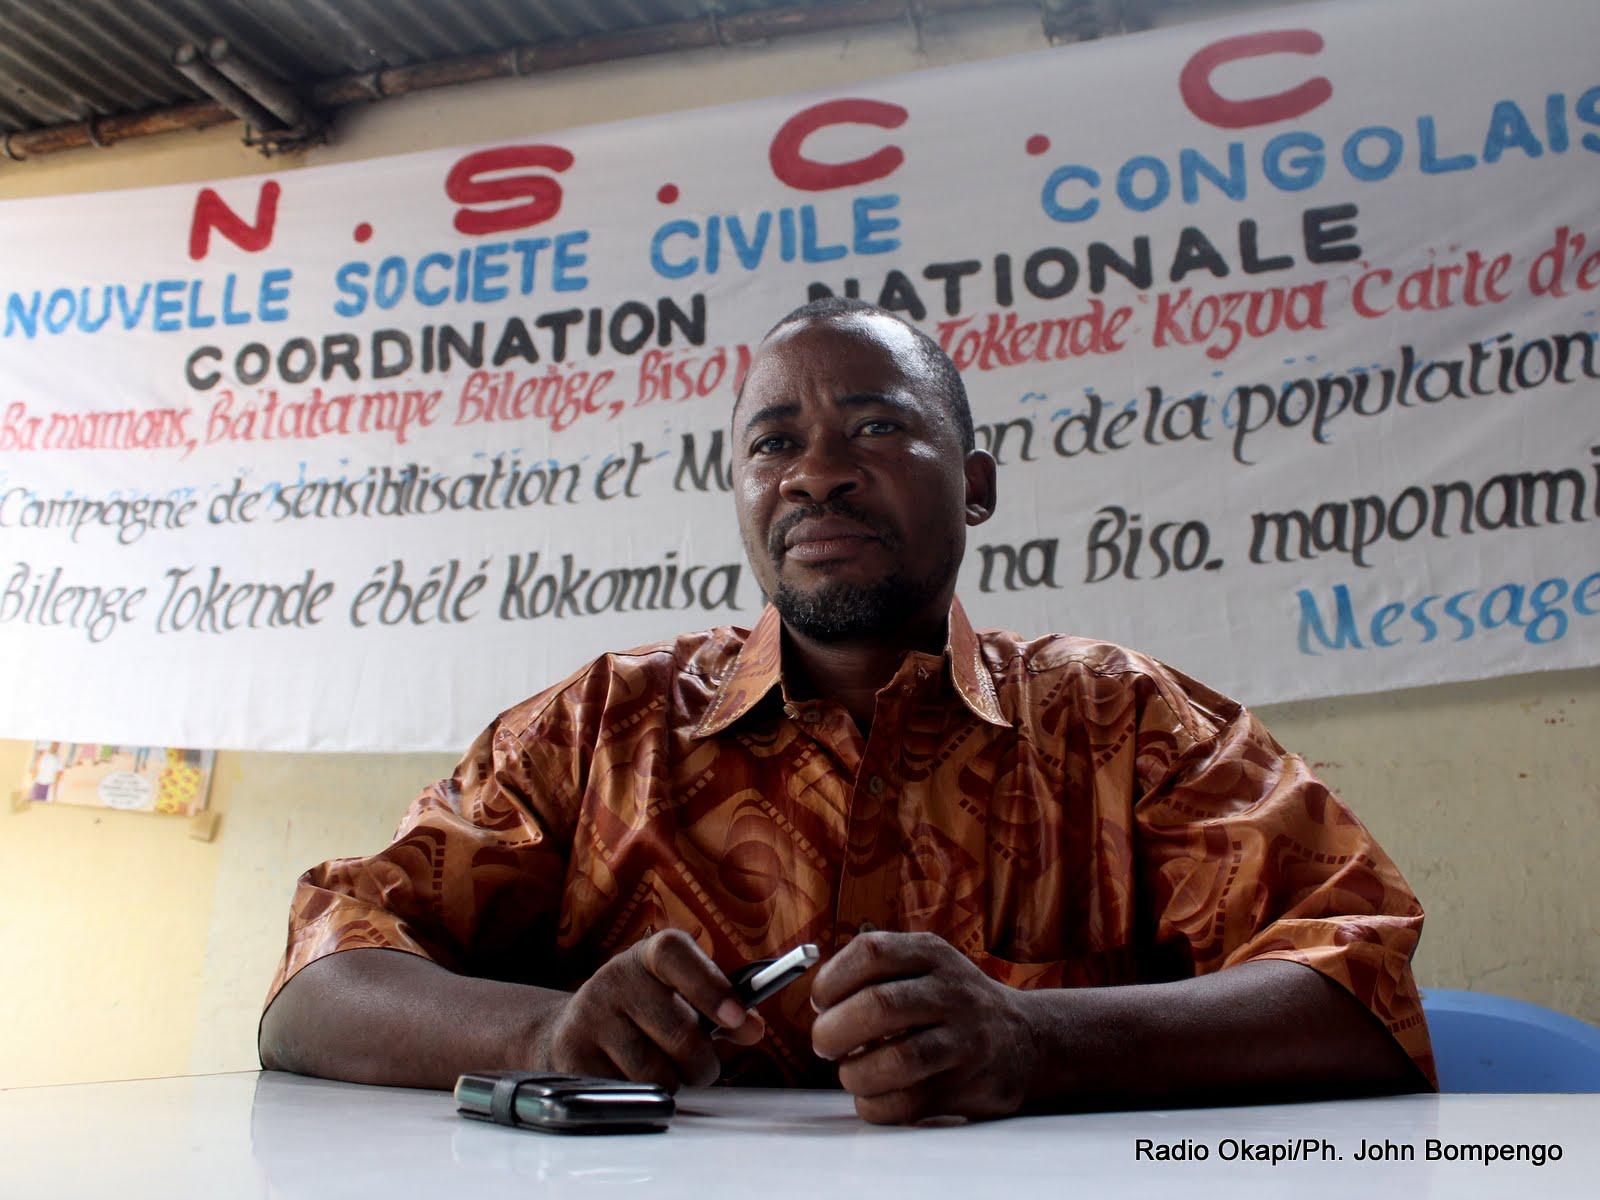 Jonas Tshiombela, Coordonnateur national de la NSCC